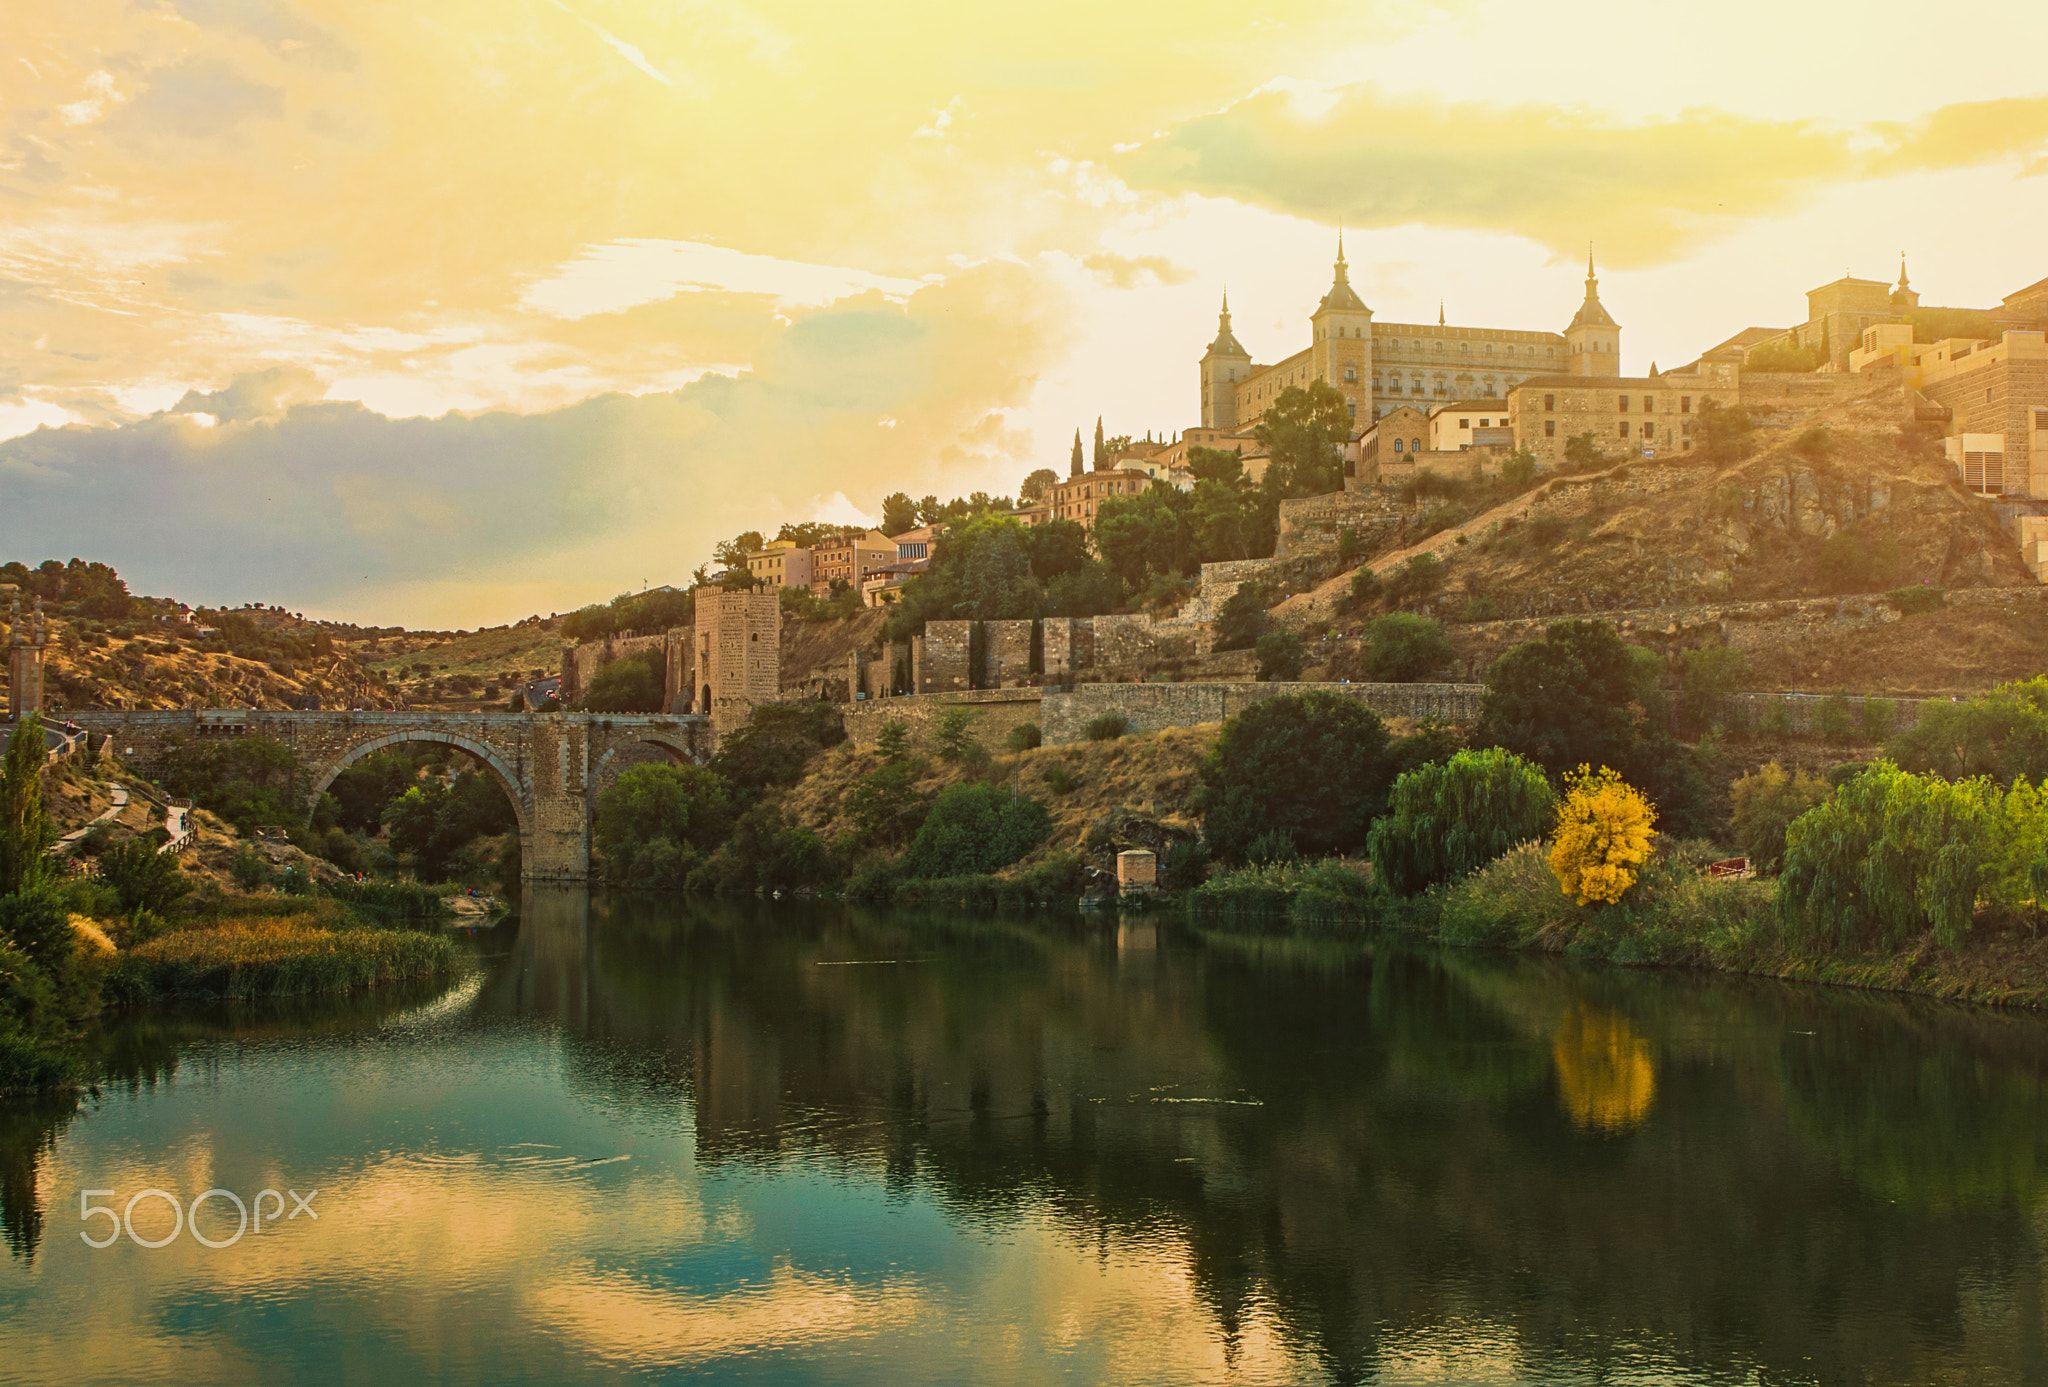 The Spanish Ballad